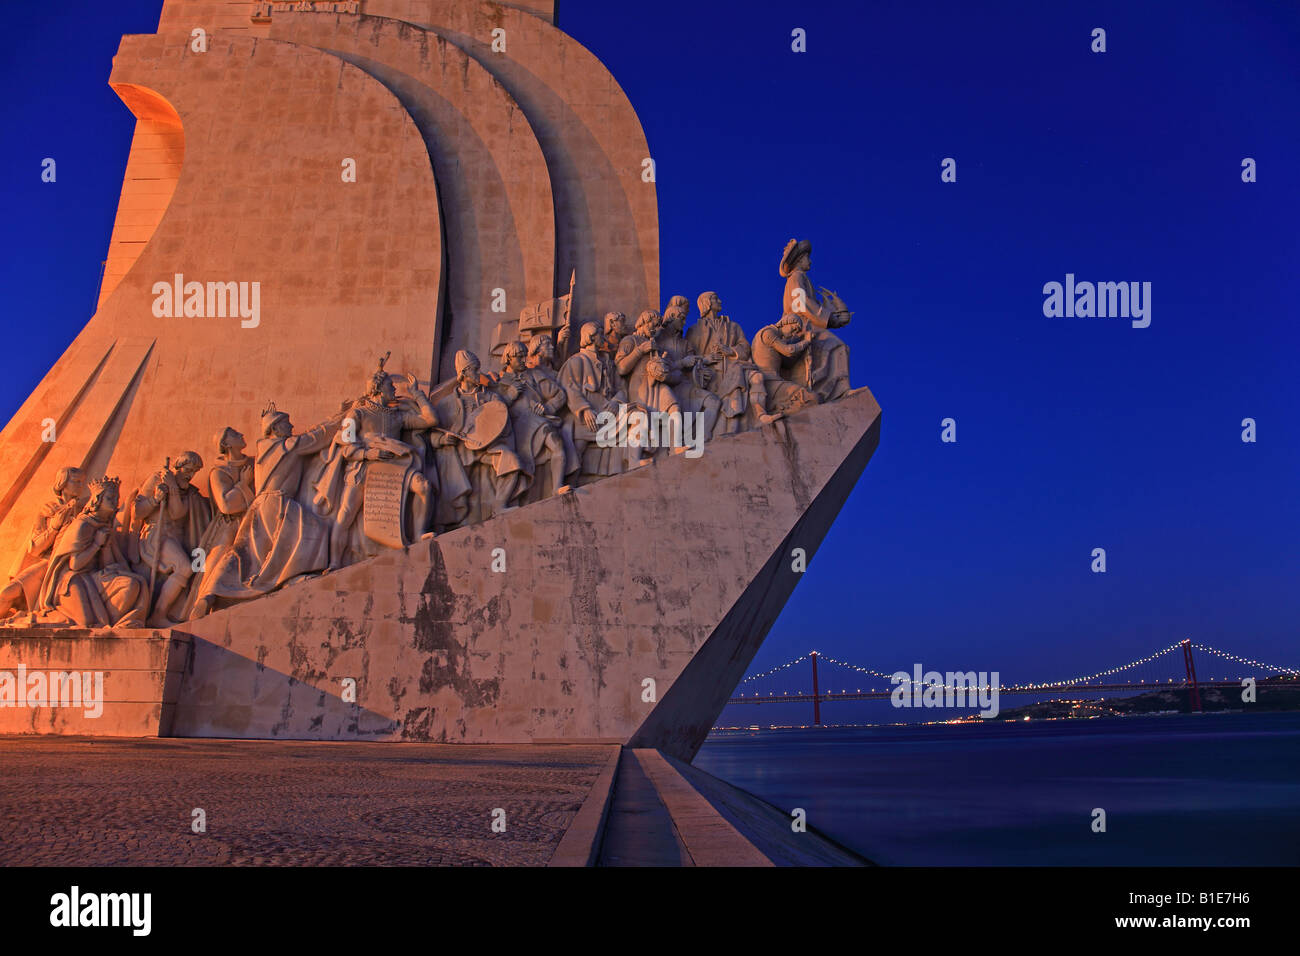 Padrao dos Descobrimentos at night, seafaring memorial, Lisbon, Portugal - Stock Image